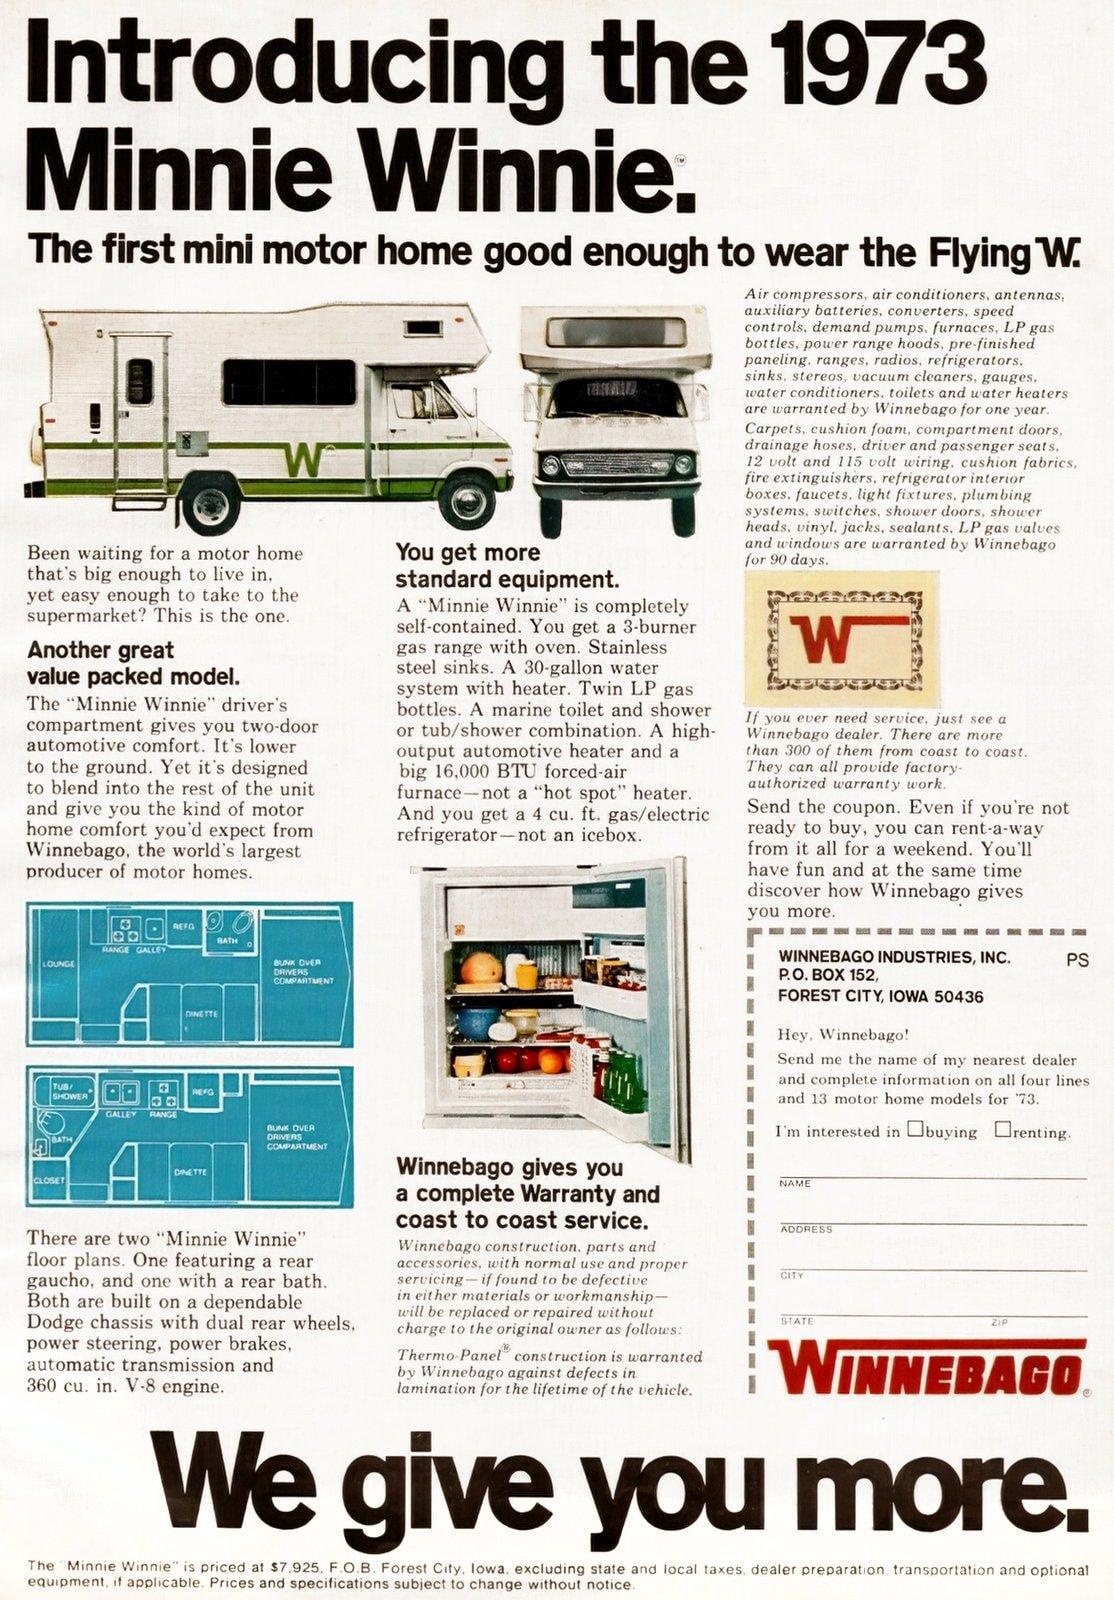 1973 Minnie Winnie motor home - Winnebago